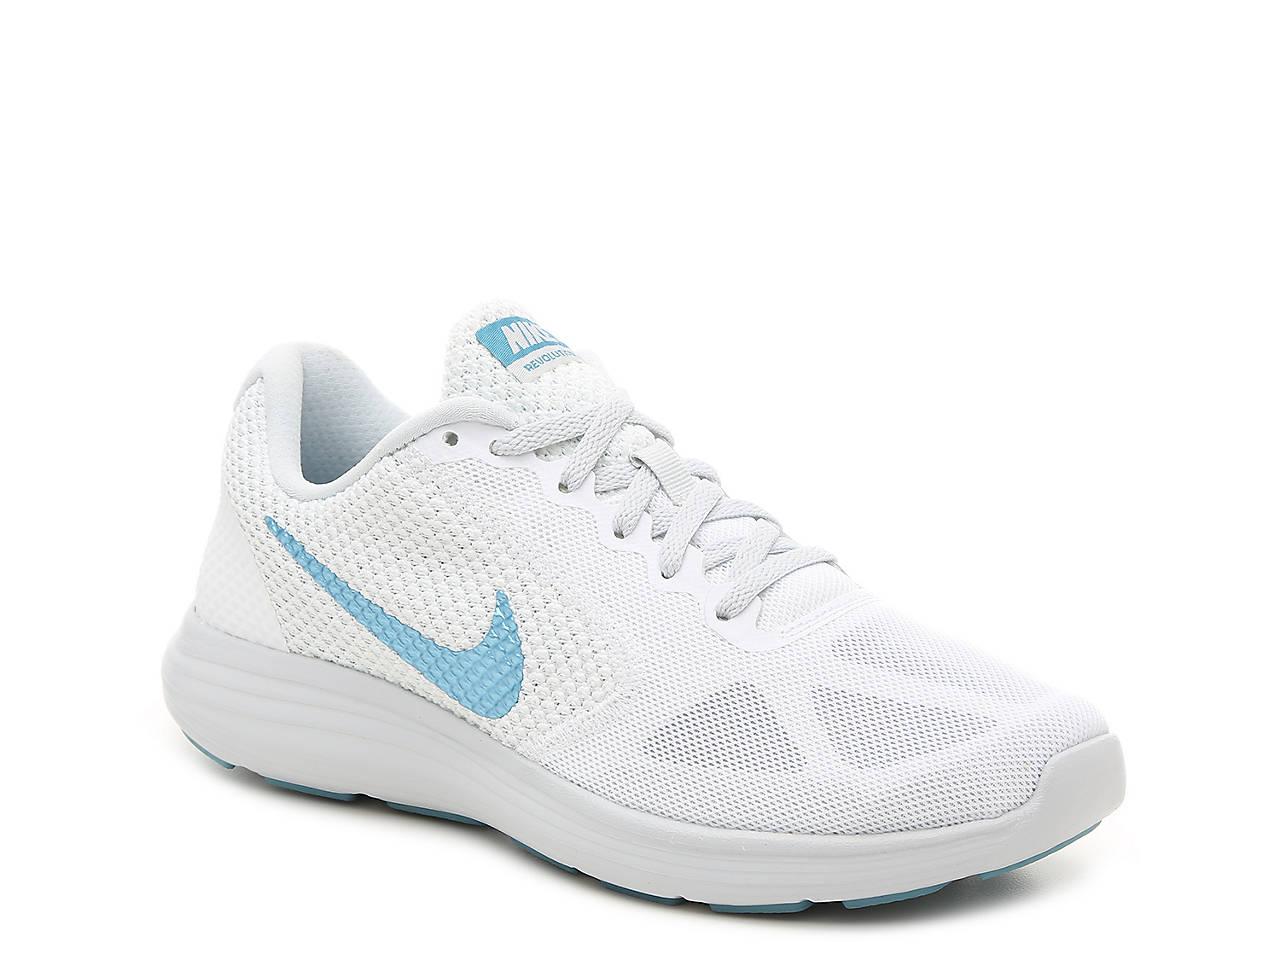 f52ebe97c136 Nike Revolution 3 Lightweight Running Shoe - Women s Women s Shoes